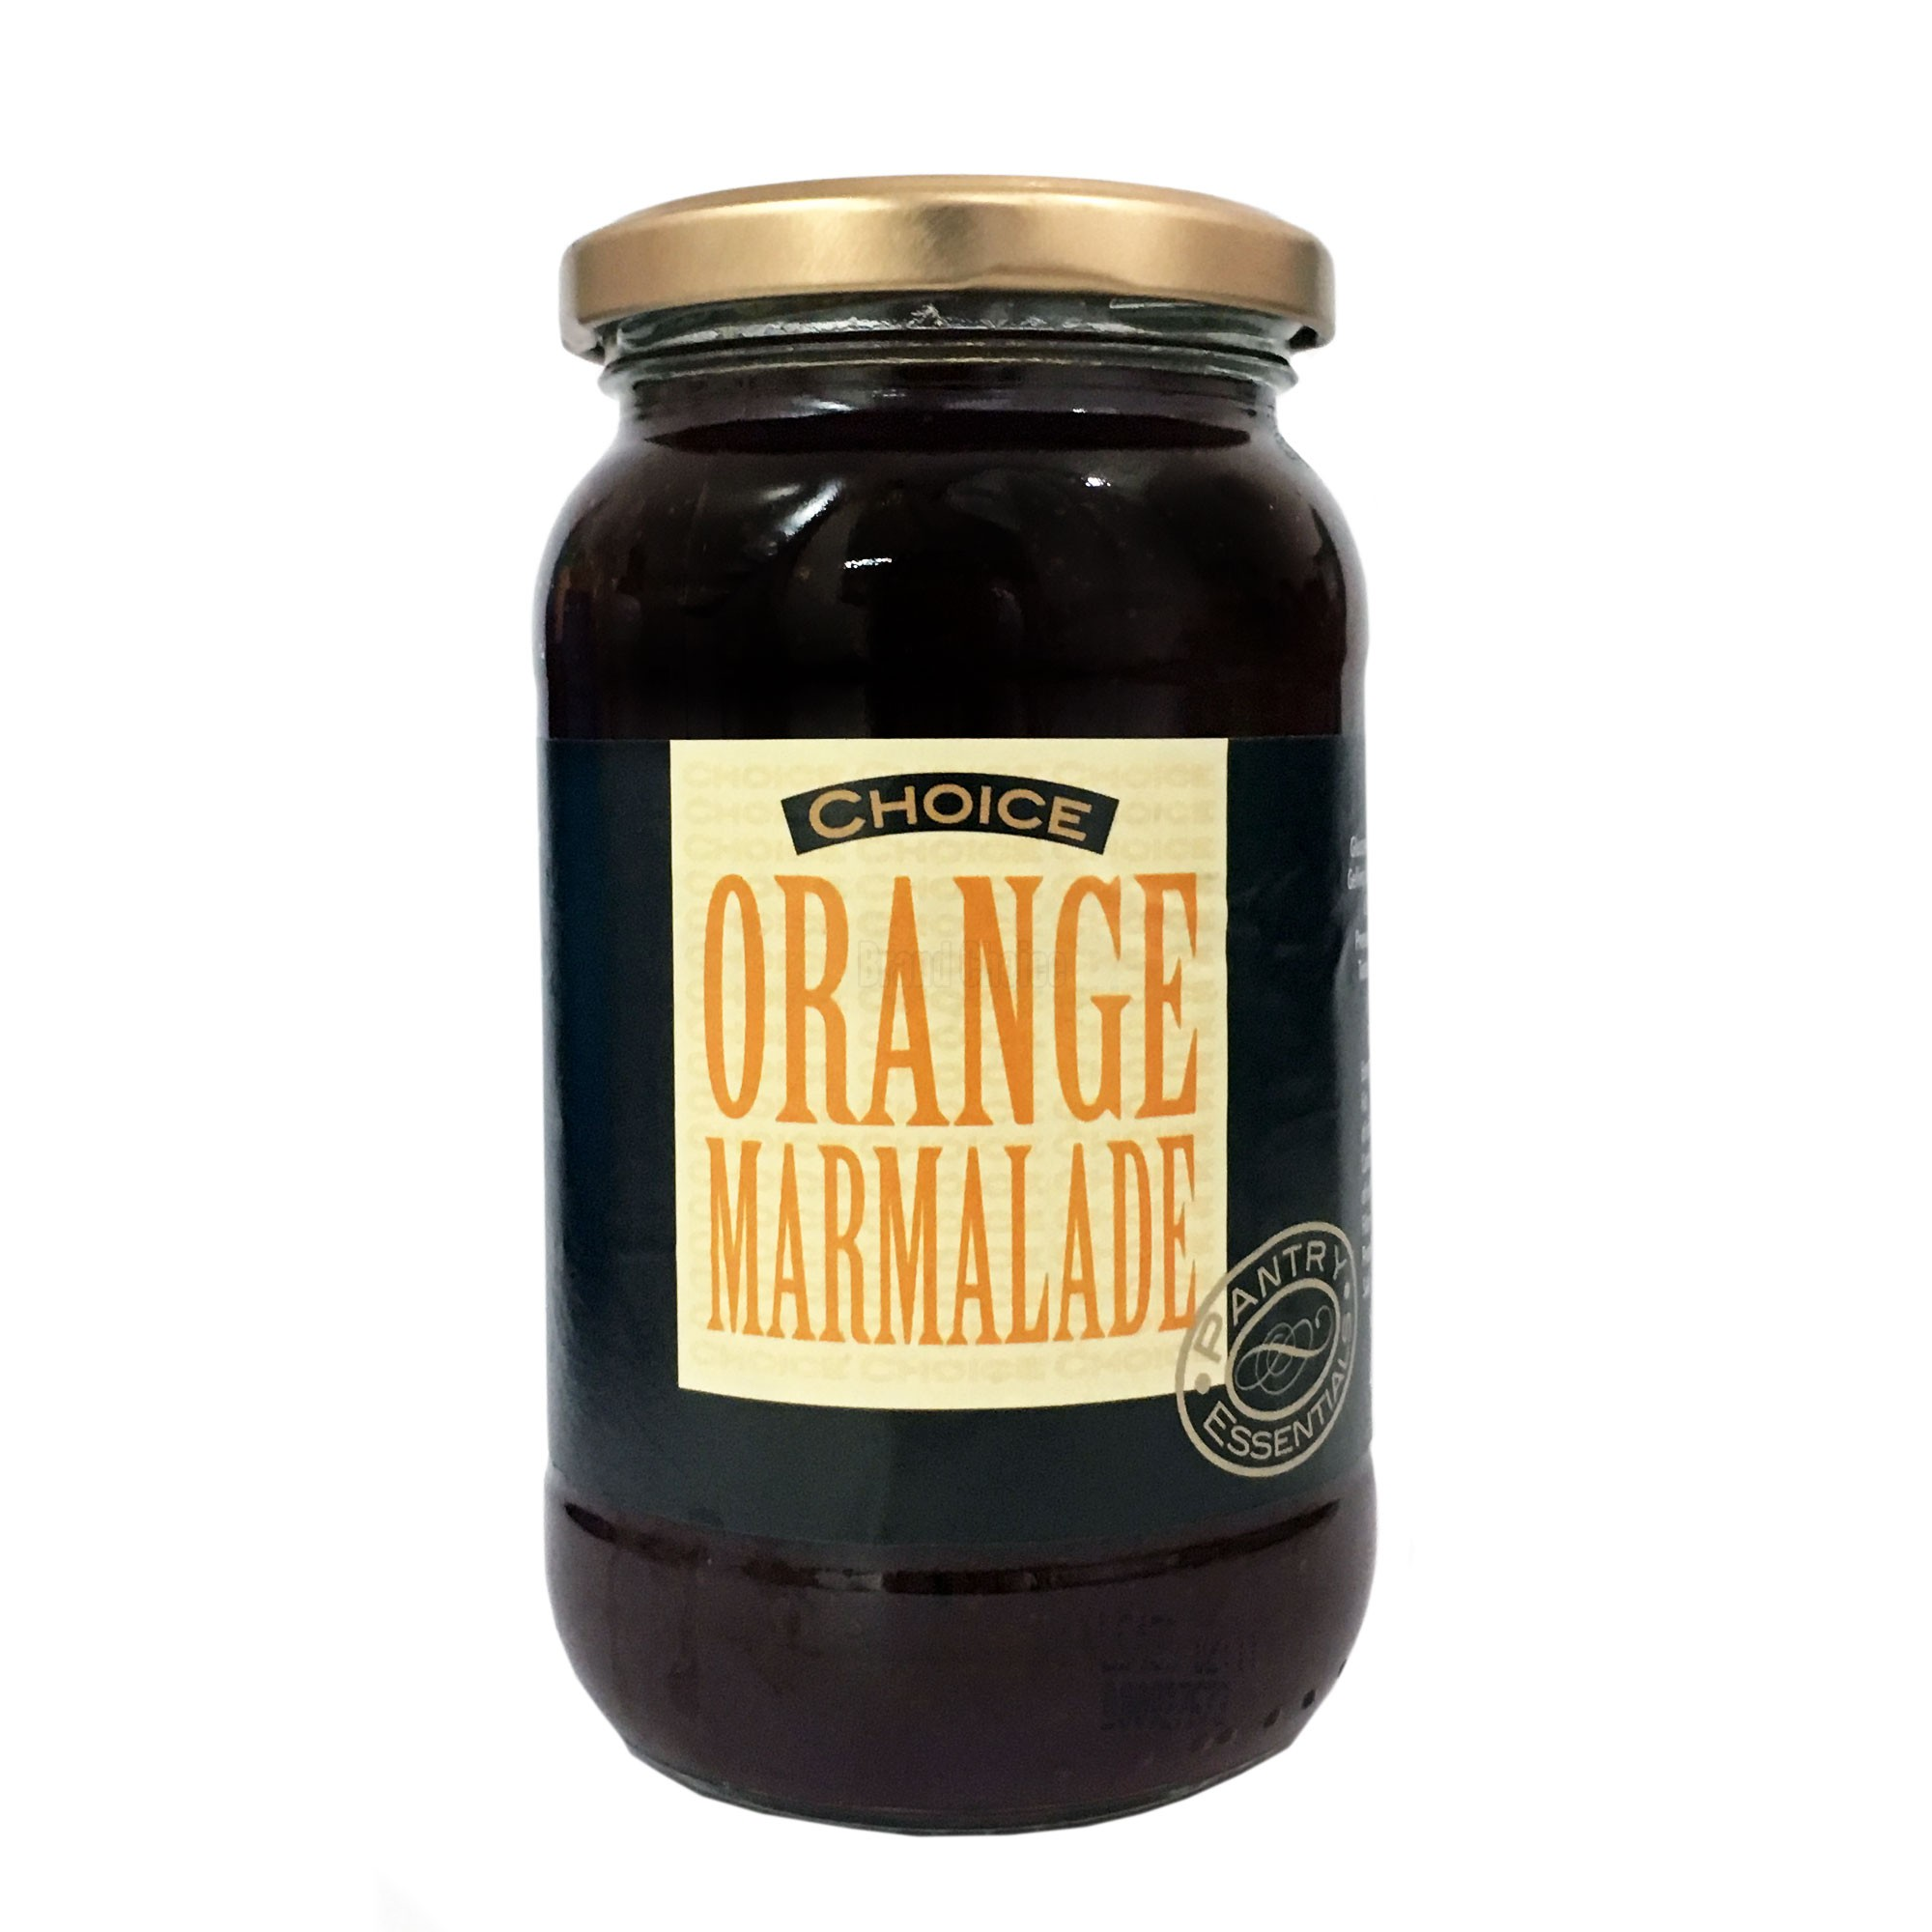 Choice Orange Marmalade 454g angol narancs dzsem